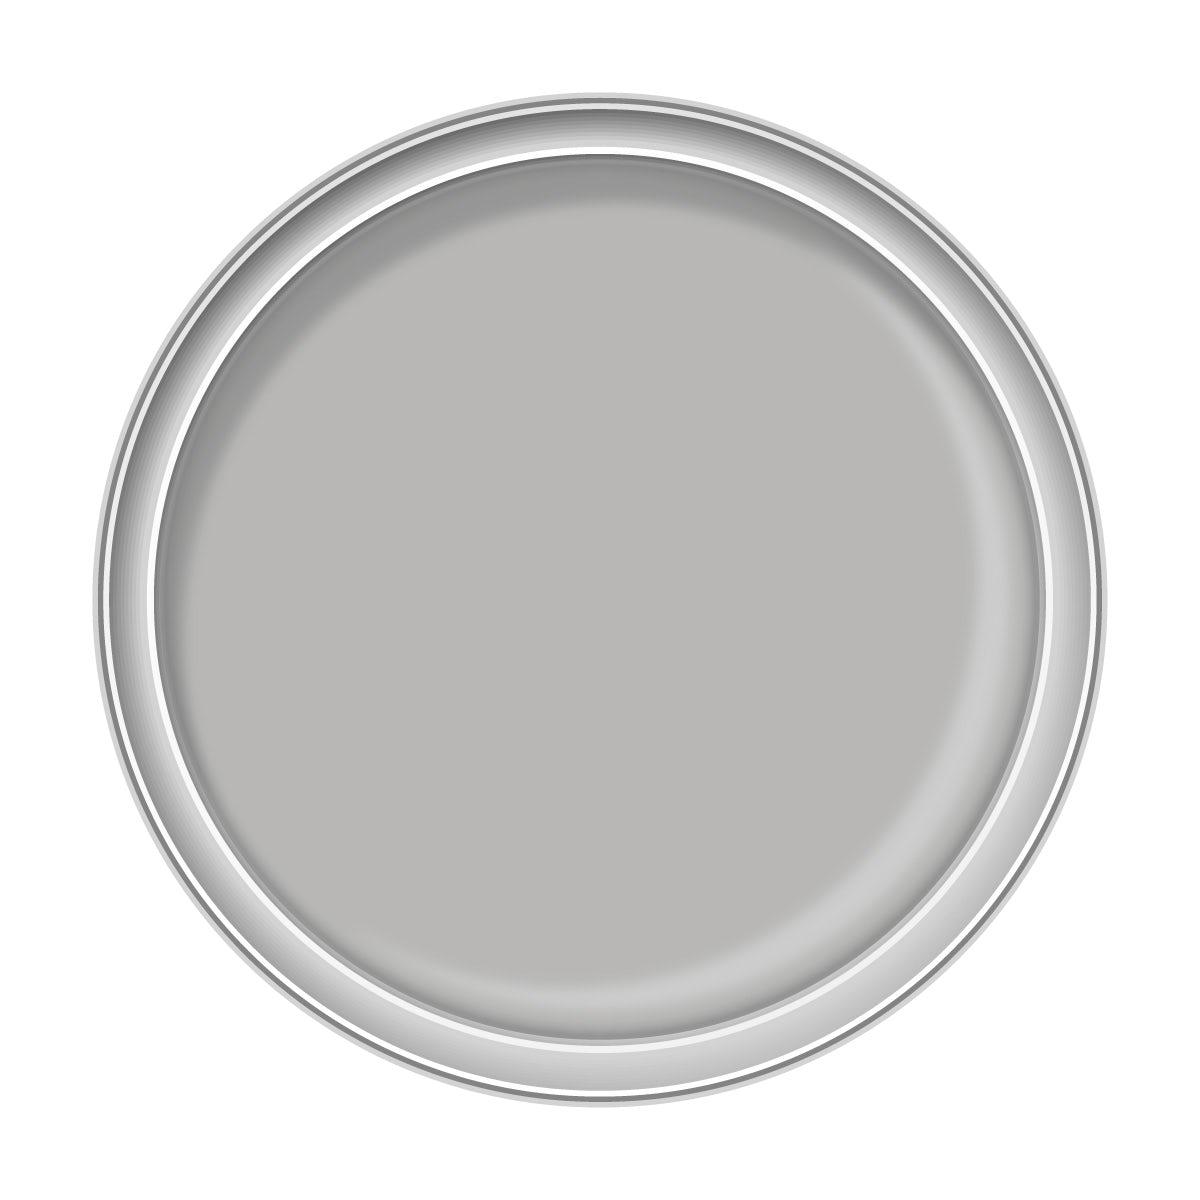 Craig & Rose ammonite kitchen & bathroom paint 2.5L